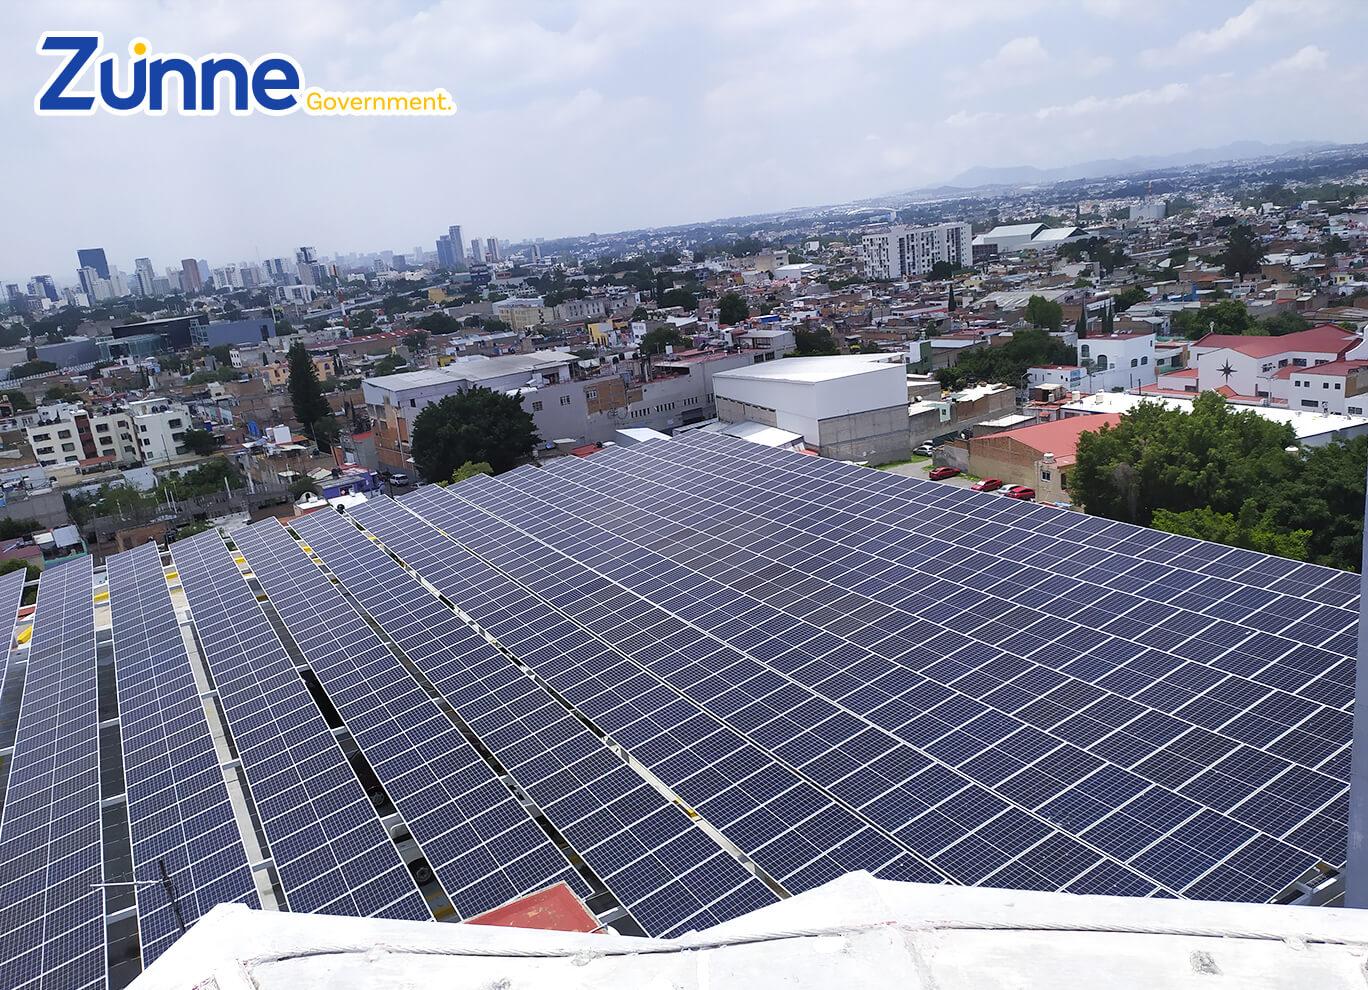 proyecto-paneles-solares-para-gobierno